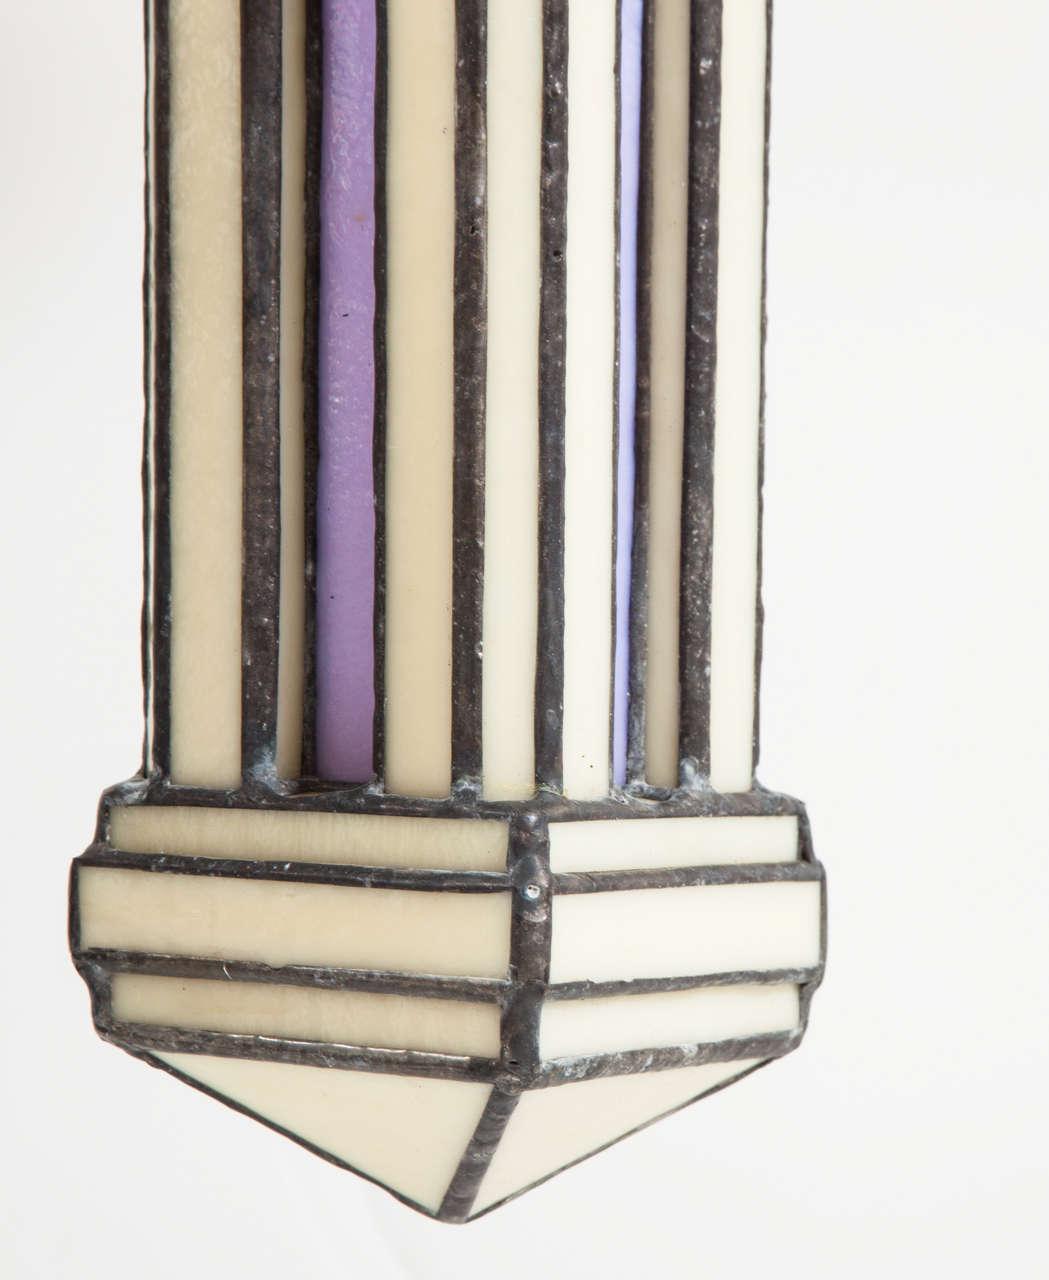 Set of Three Leaded Glass Pendant Light Fixture by Adam Kurtzman For Sale 3